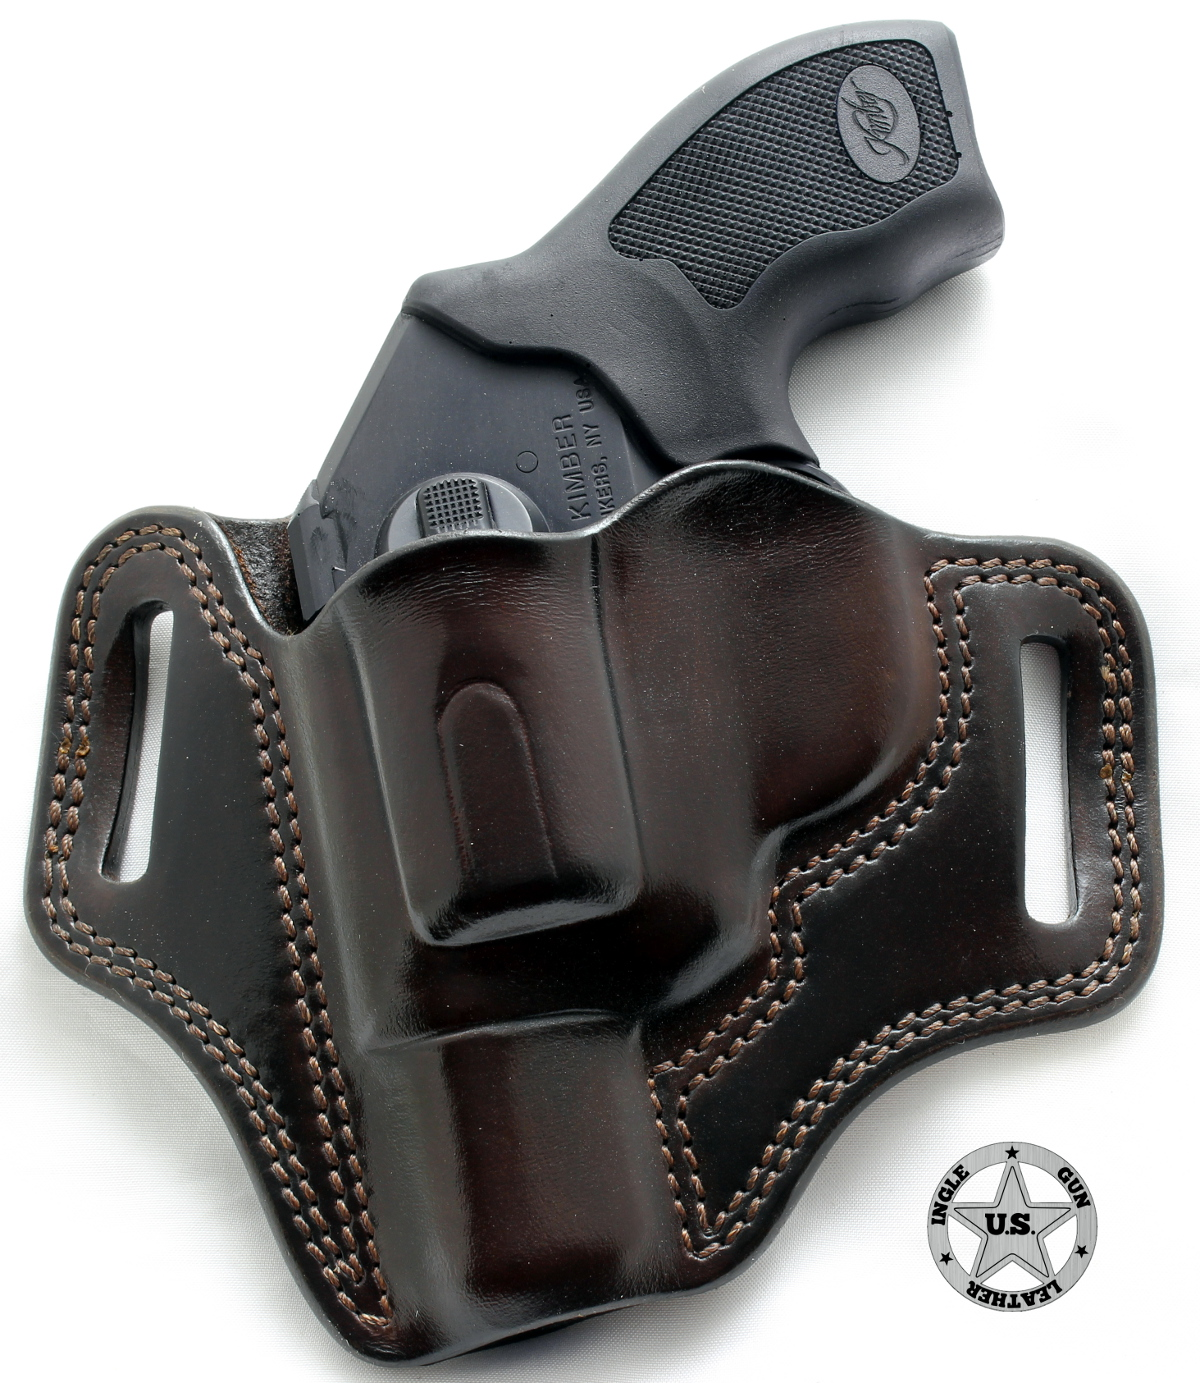 Kimber K6S Holster - Gun Holsters, Rifle Slings and Knife Sheathes